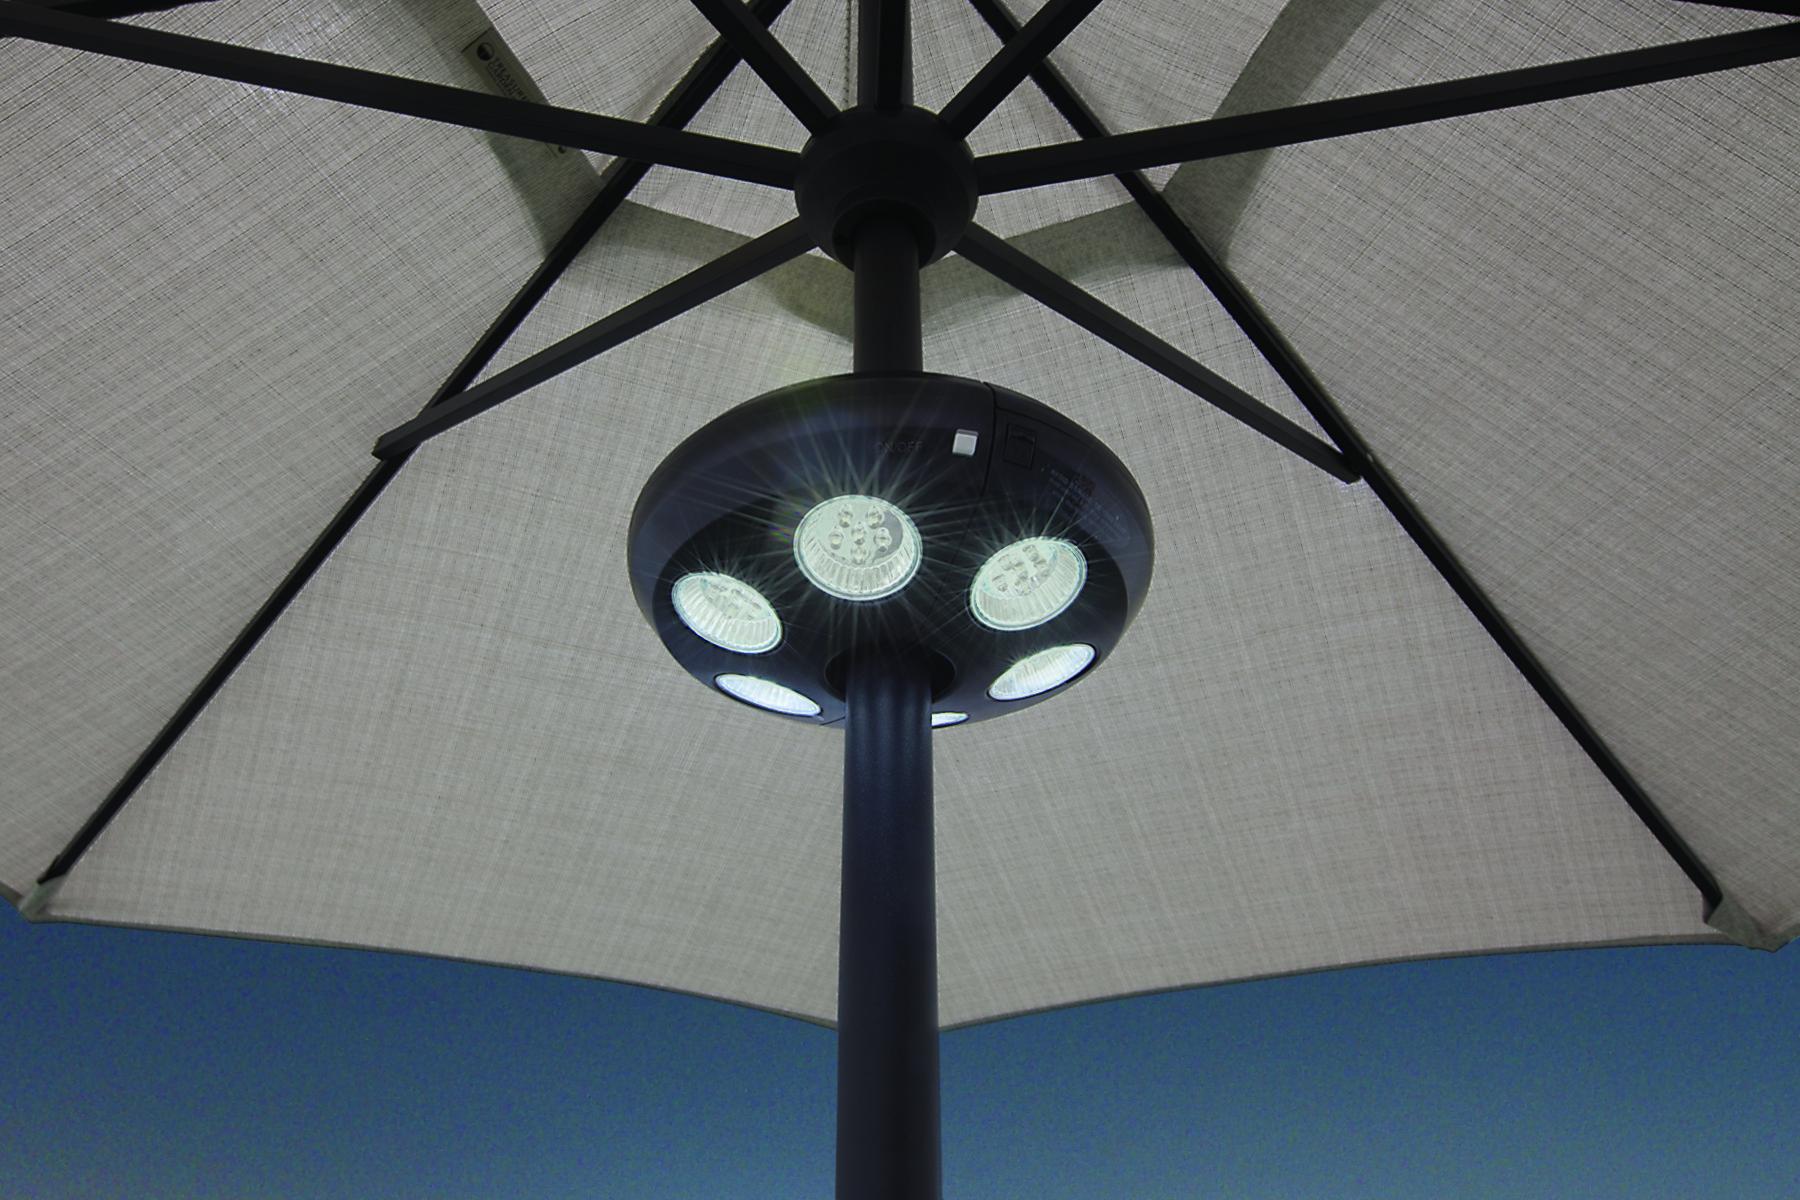 Large Vega Umbrella Light W 36 Led Lights Hauser S Patio